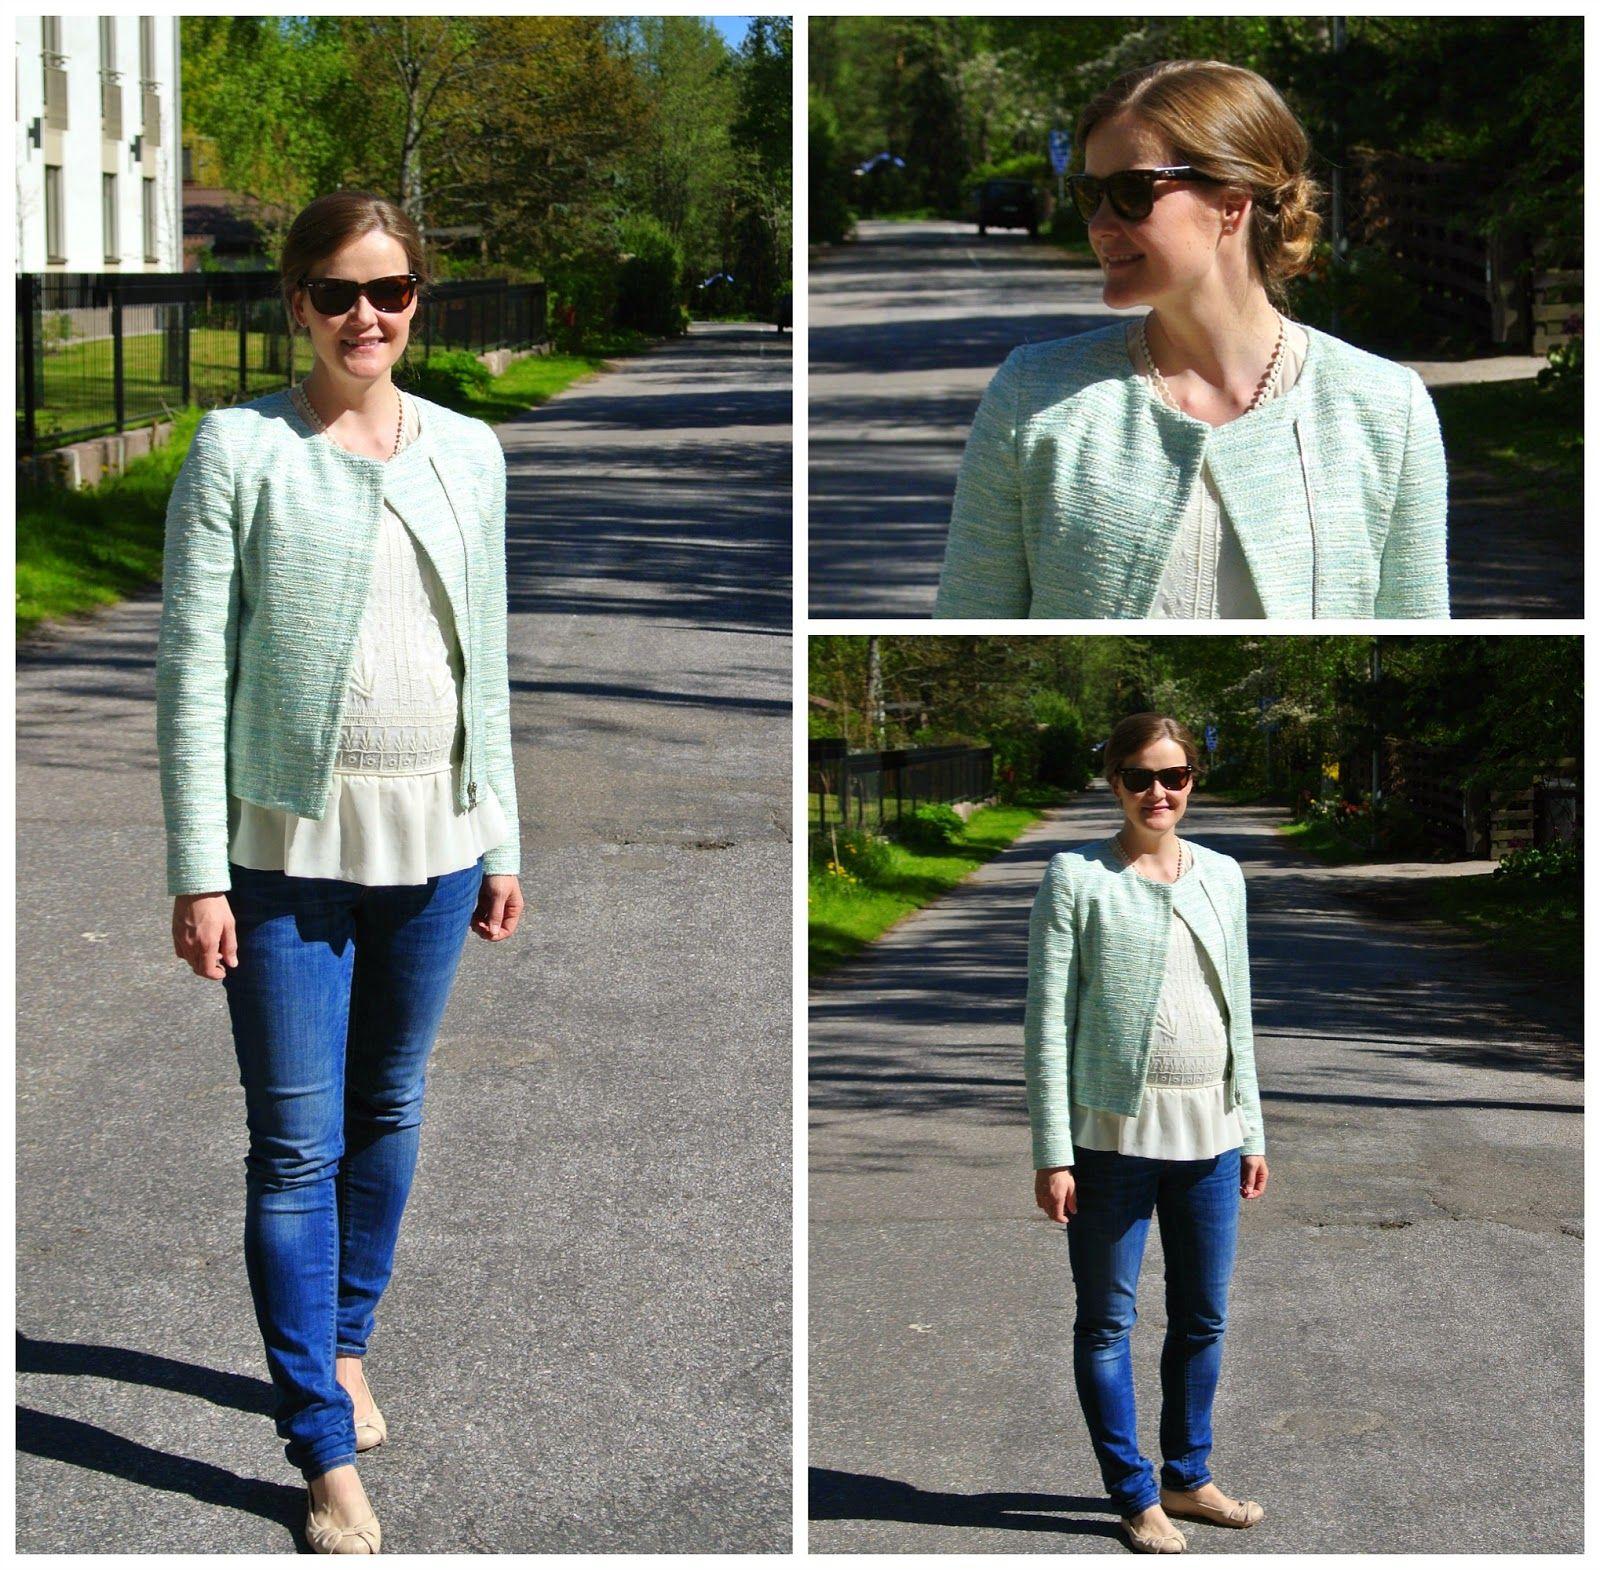 #pregnancystyle   www.stellarstories.fi @stellarstoriesblog  #stellarstoriesblog